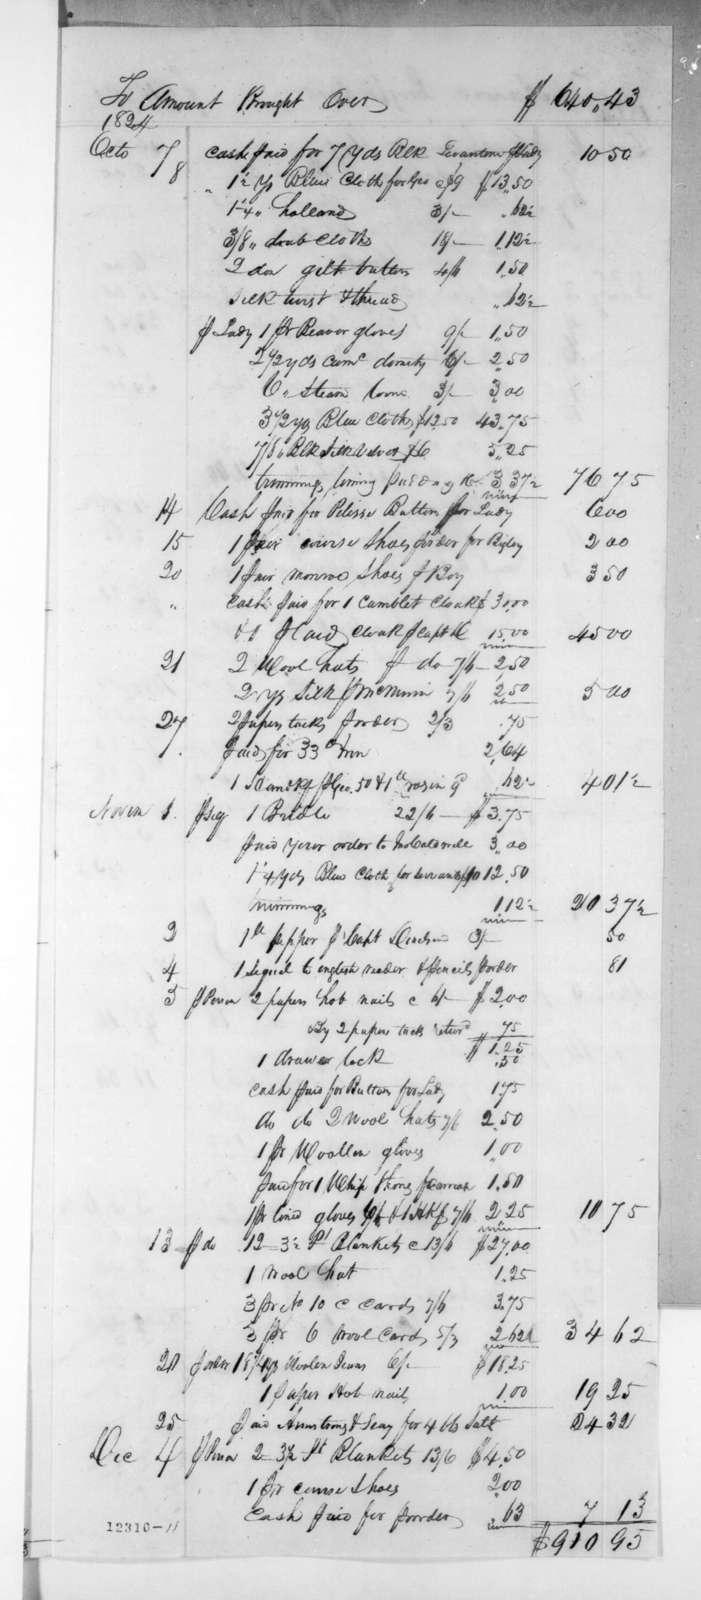 Josiah Nichol to Andrew Jackson, April 27, 1825